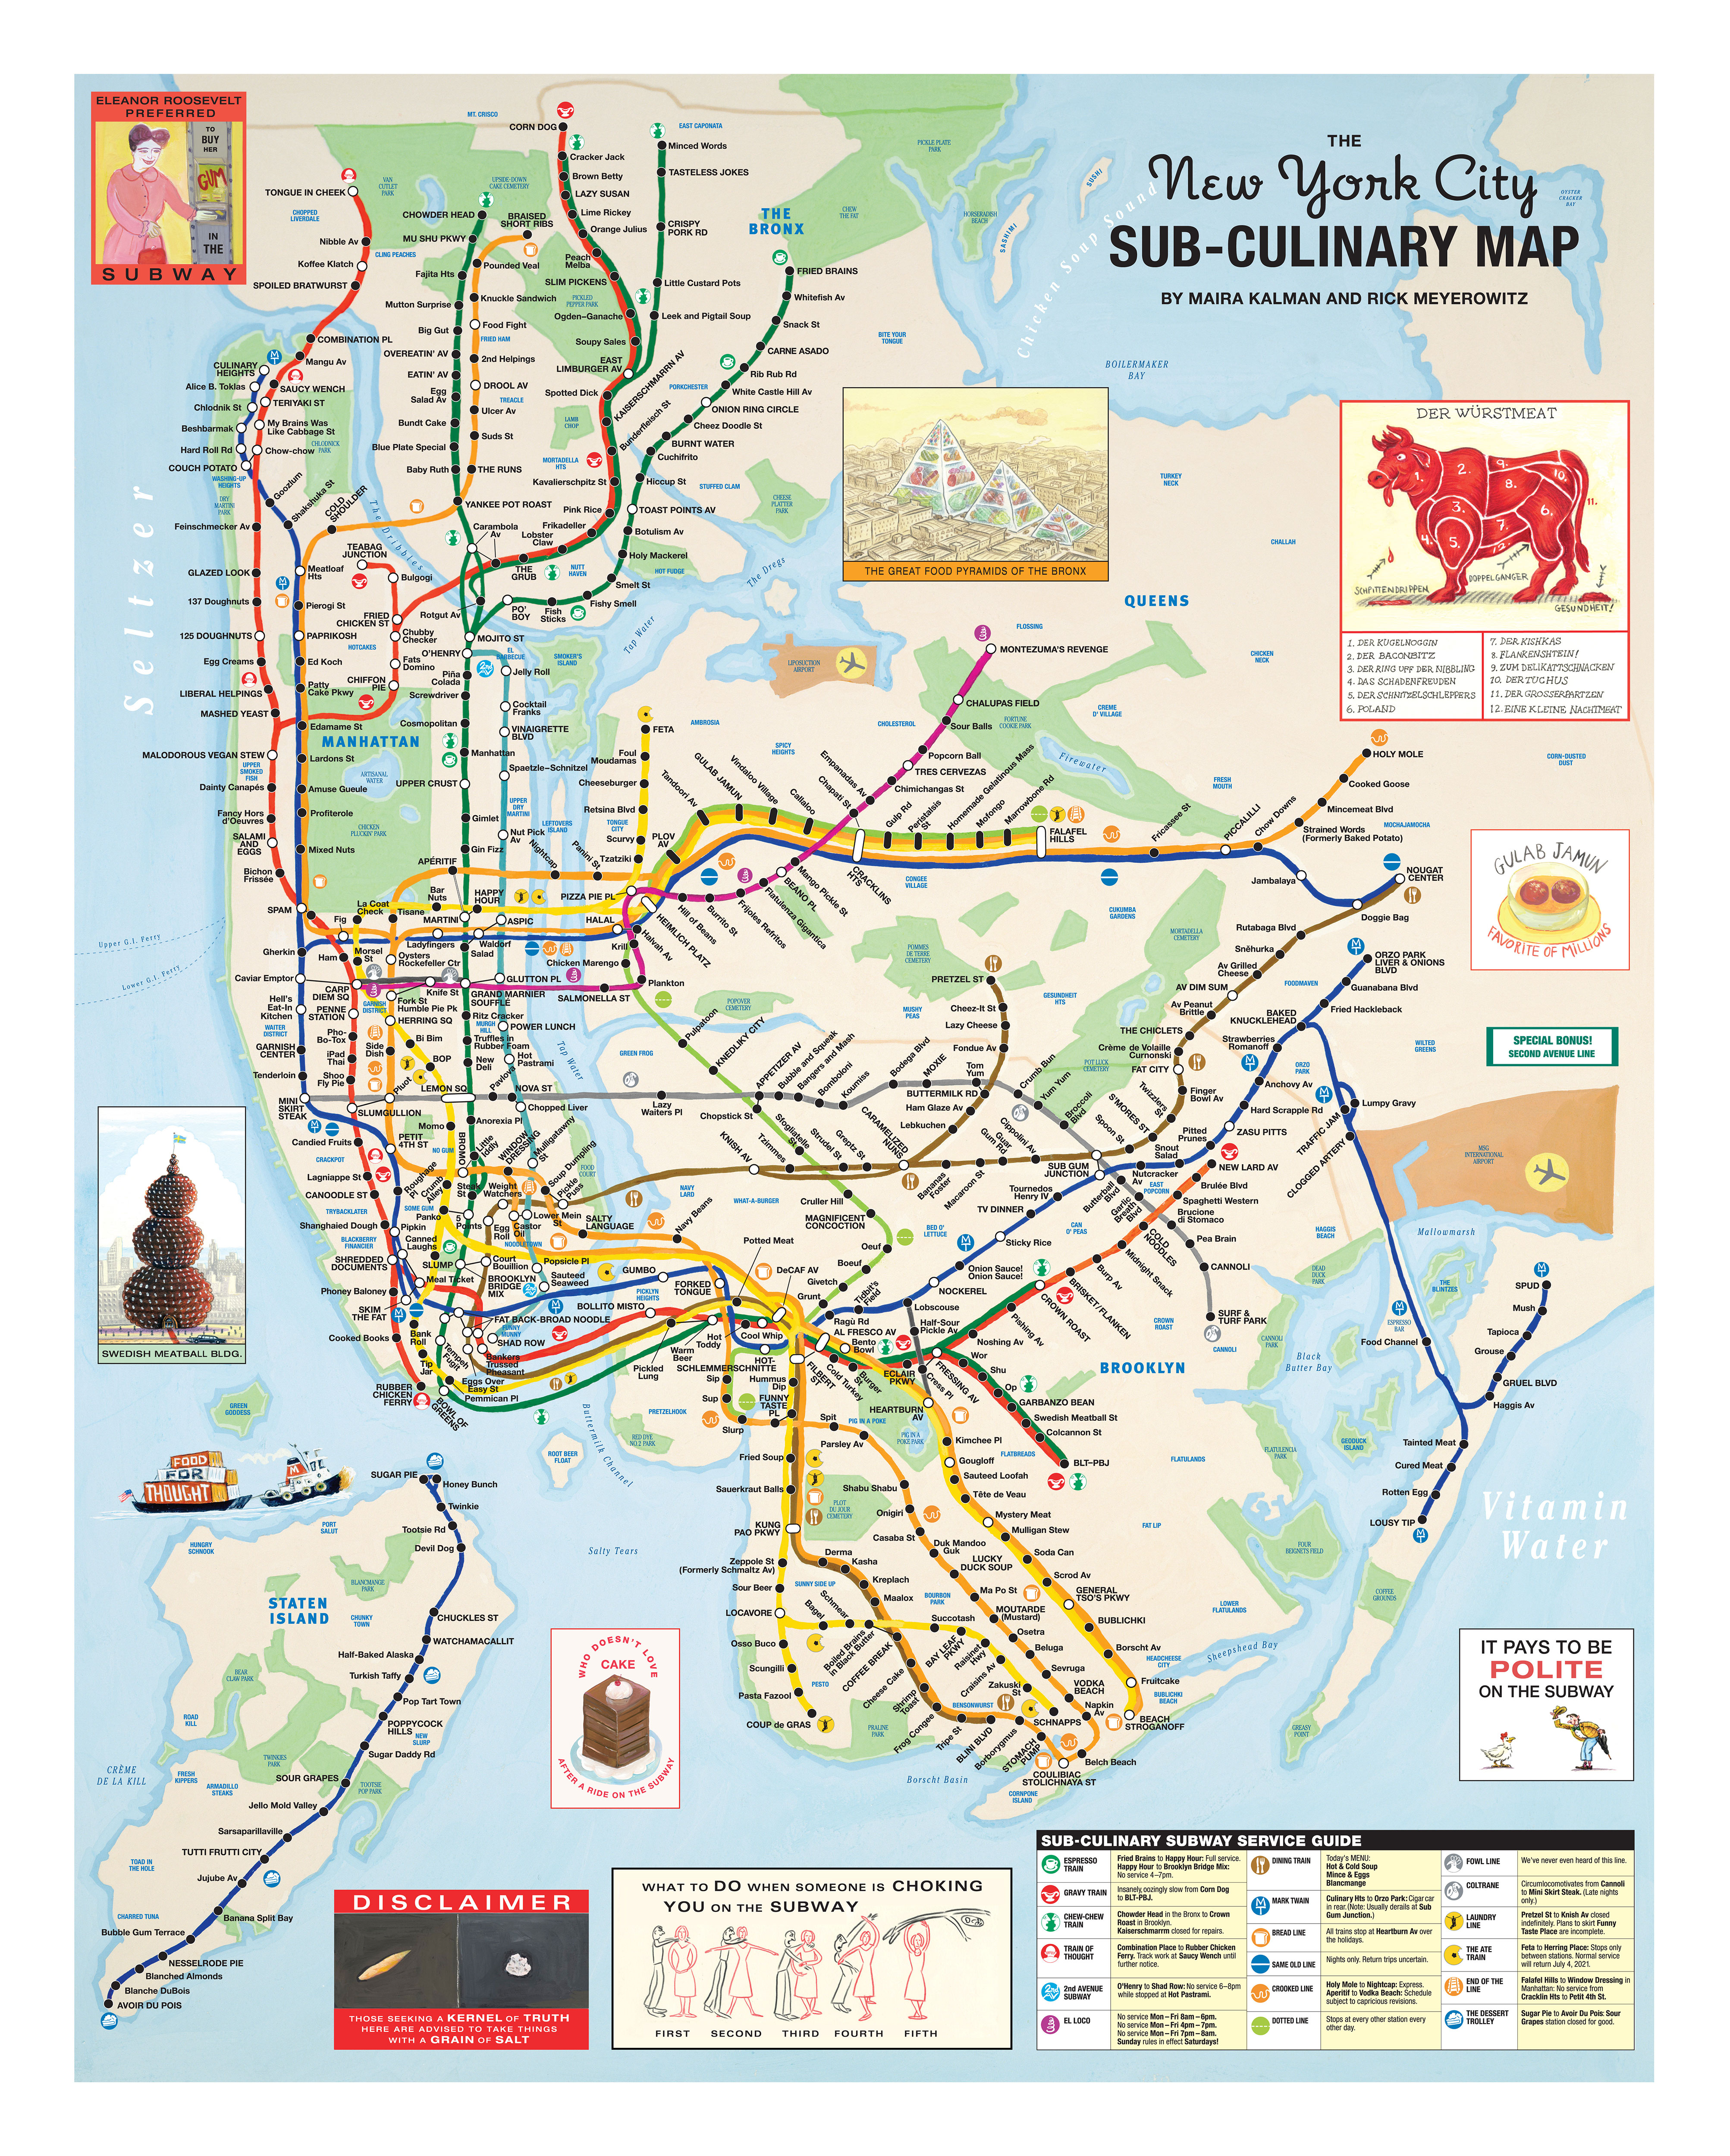 New York City Map The New York City Sub Culinary Map | Rick Meyerowitz New York City Map